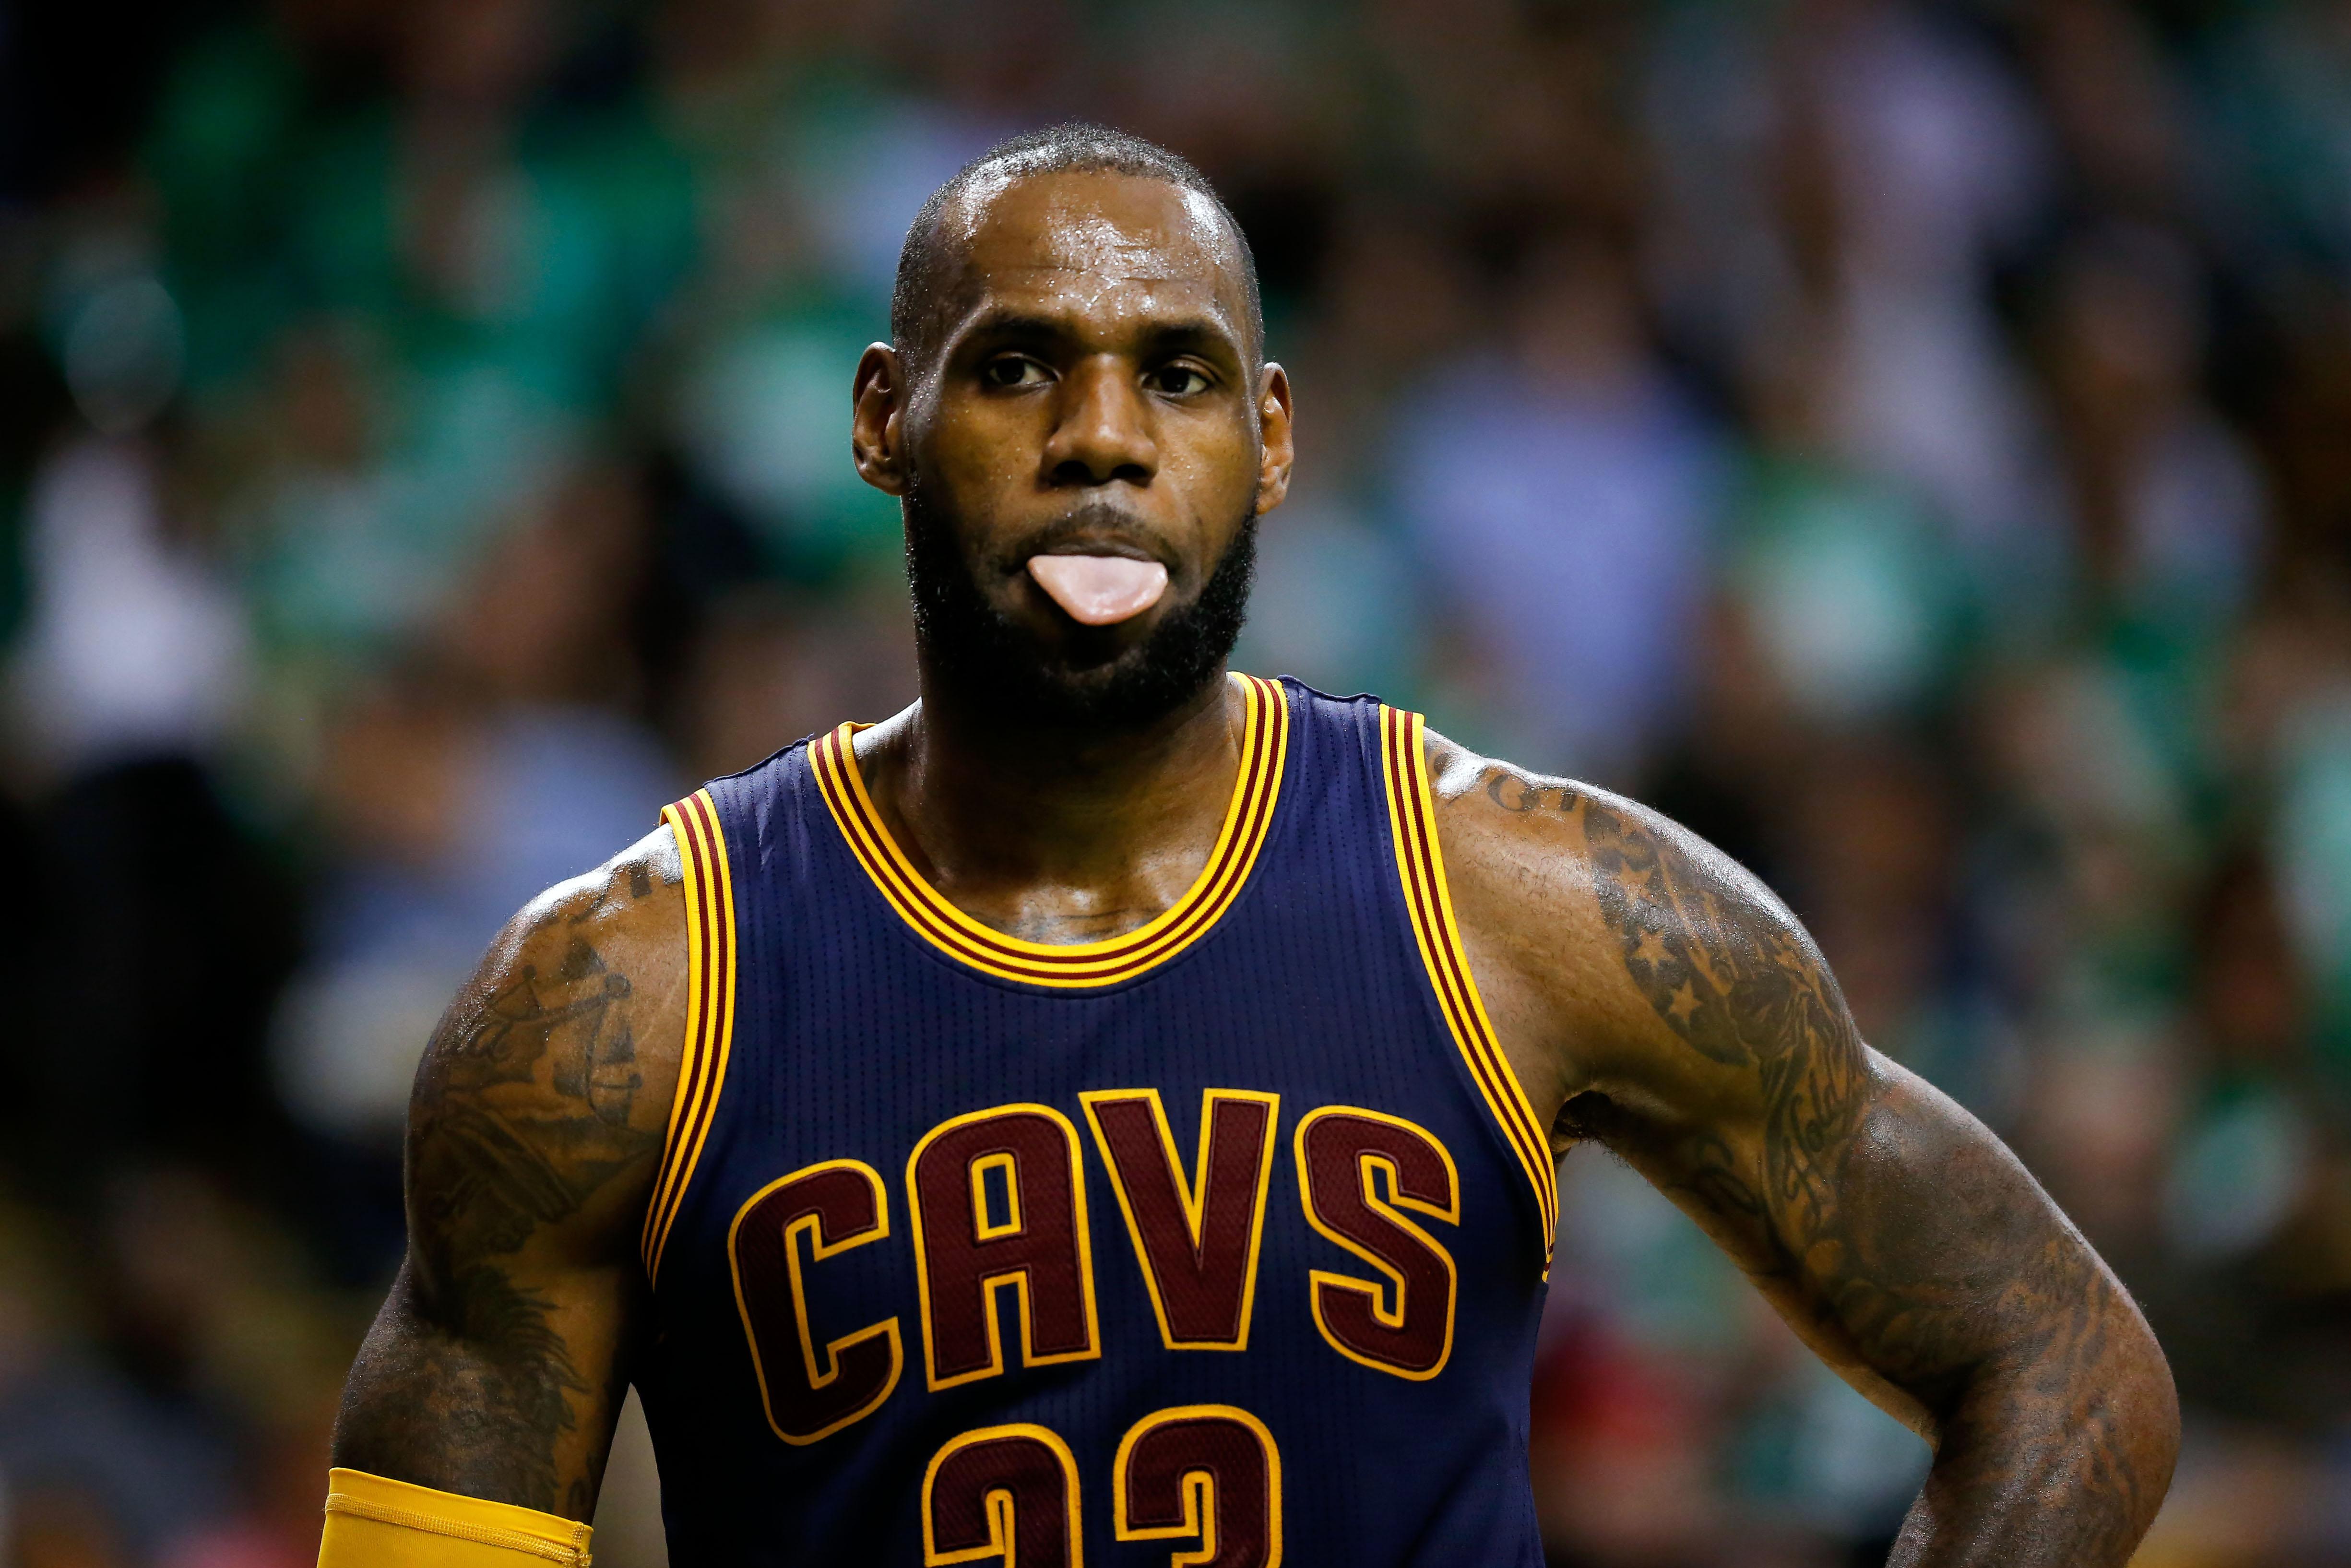 Lakers rumors: Three reasons LeBron James would be bad for LA - Page 2